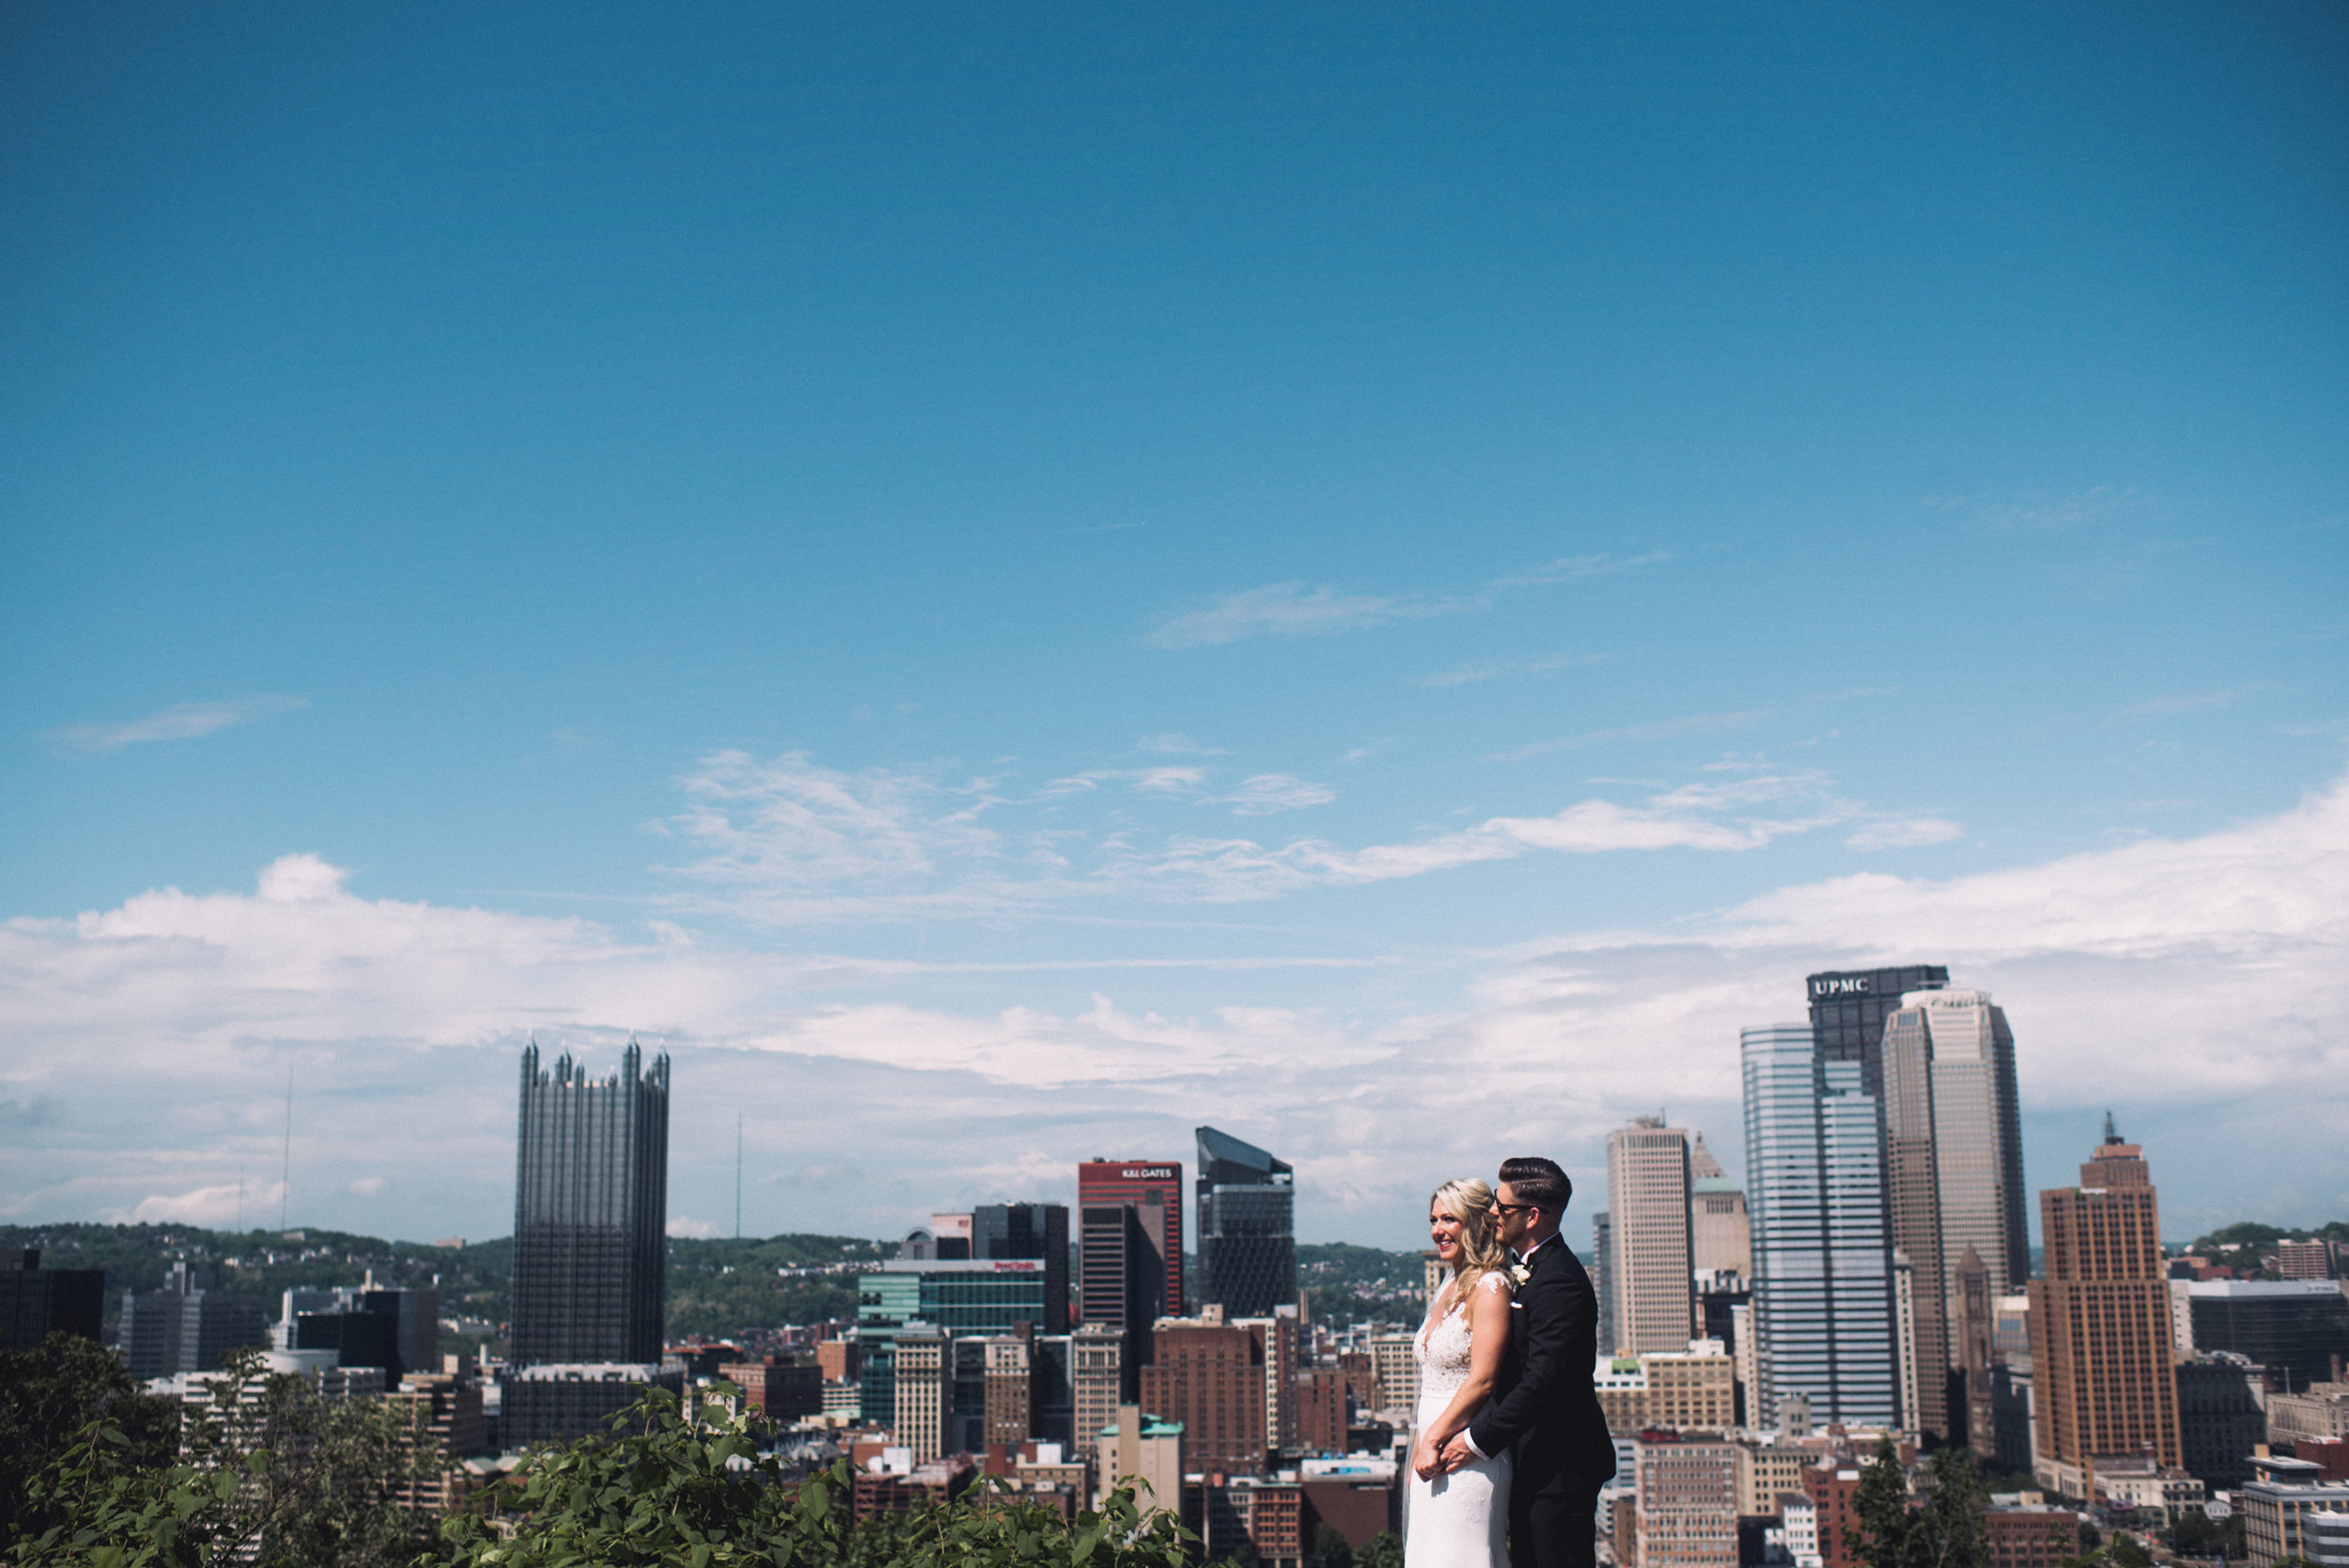 Pittsburgh Pennsylvania New York NYC Wedding Photographer Photojournalist Luxury Downtown Opera - Stirpe 962.jpg